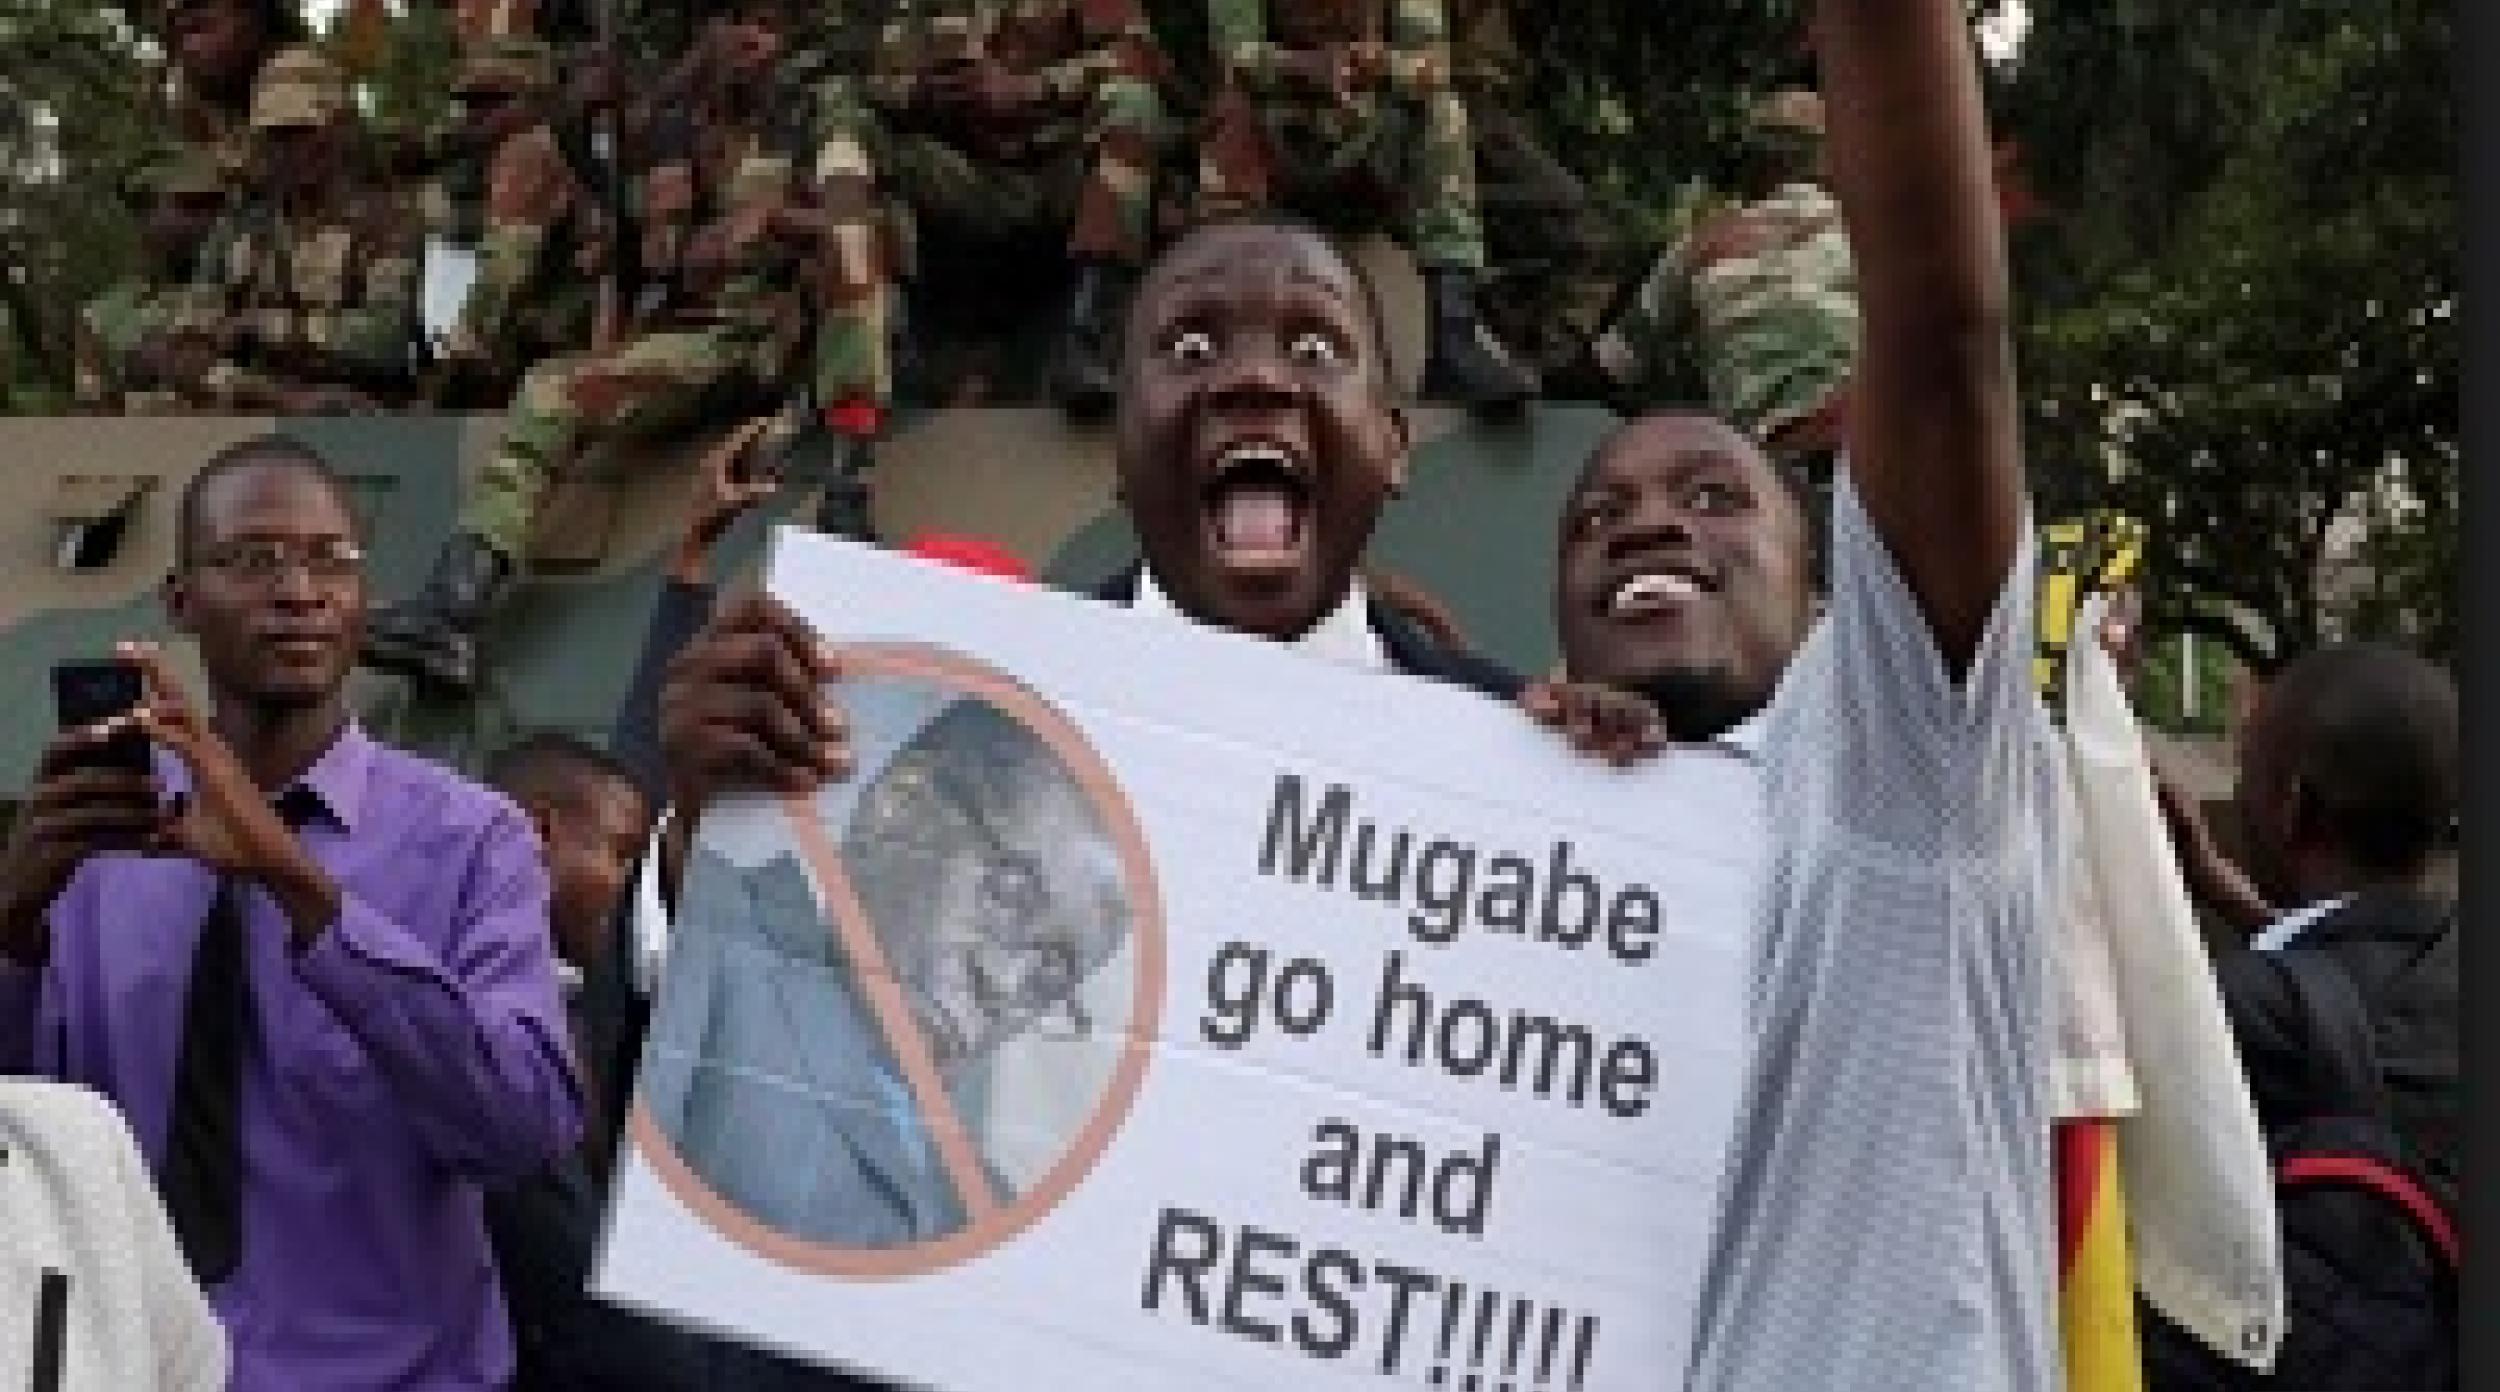 NEWS: ዚምባብዌያዊያን የሙጋቤን ሥልጣን መልቀቅ ምክንያት በማድረግ ደስታቸውን እየገለፁ ይገኛሉ - Mugabe Resigns: Zimbabwe Celebrates End of an Era